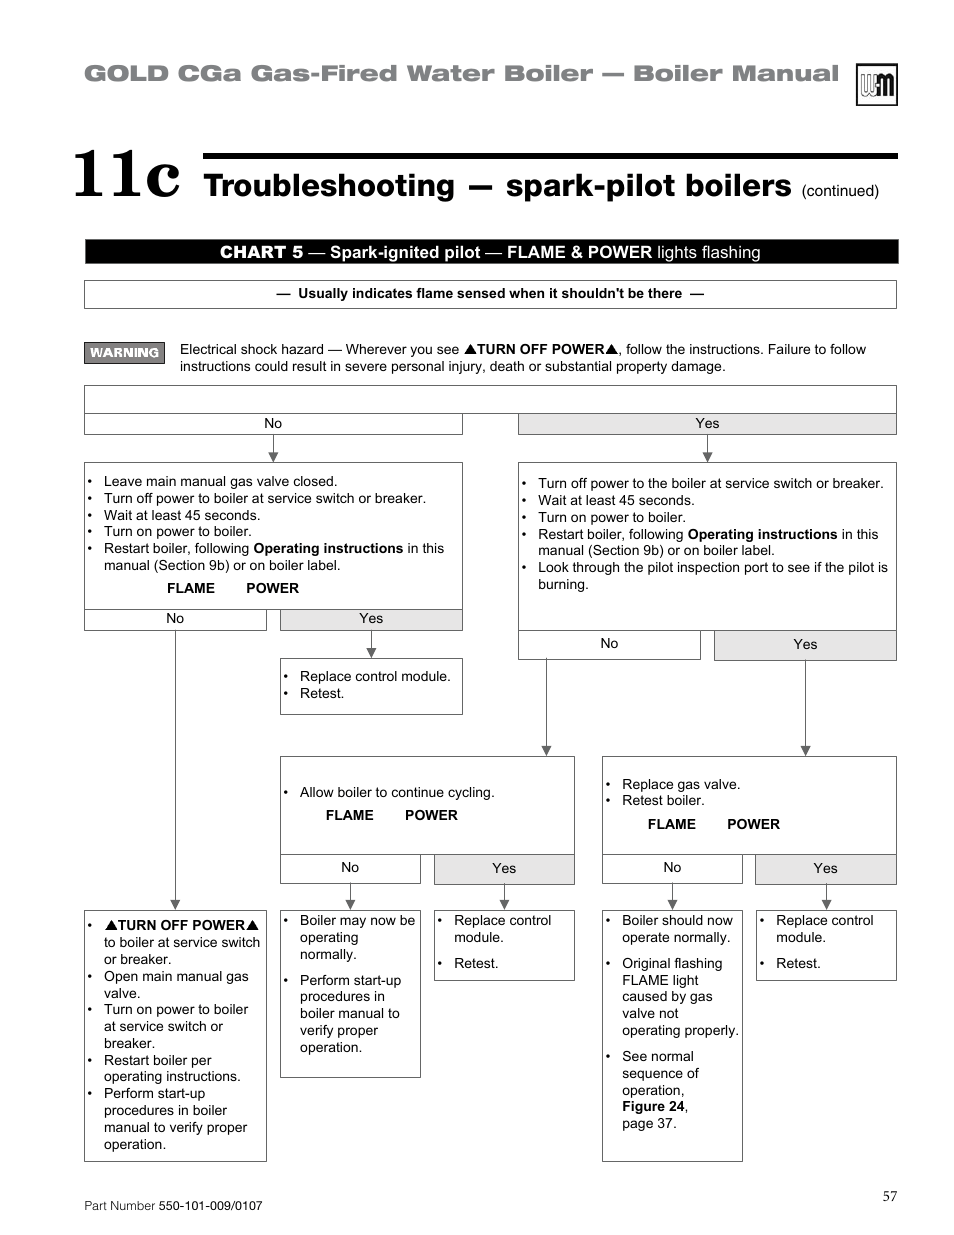 Weil Mclain Cga Boiler Manual Schematic Diagram